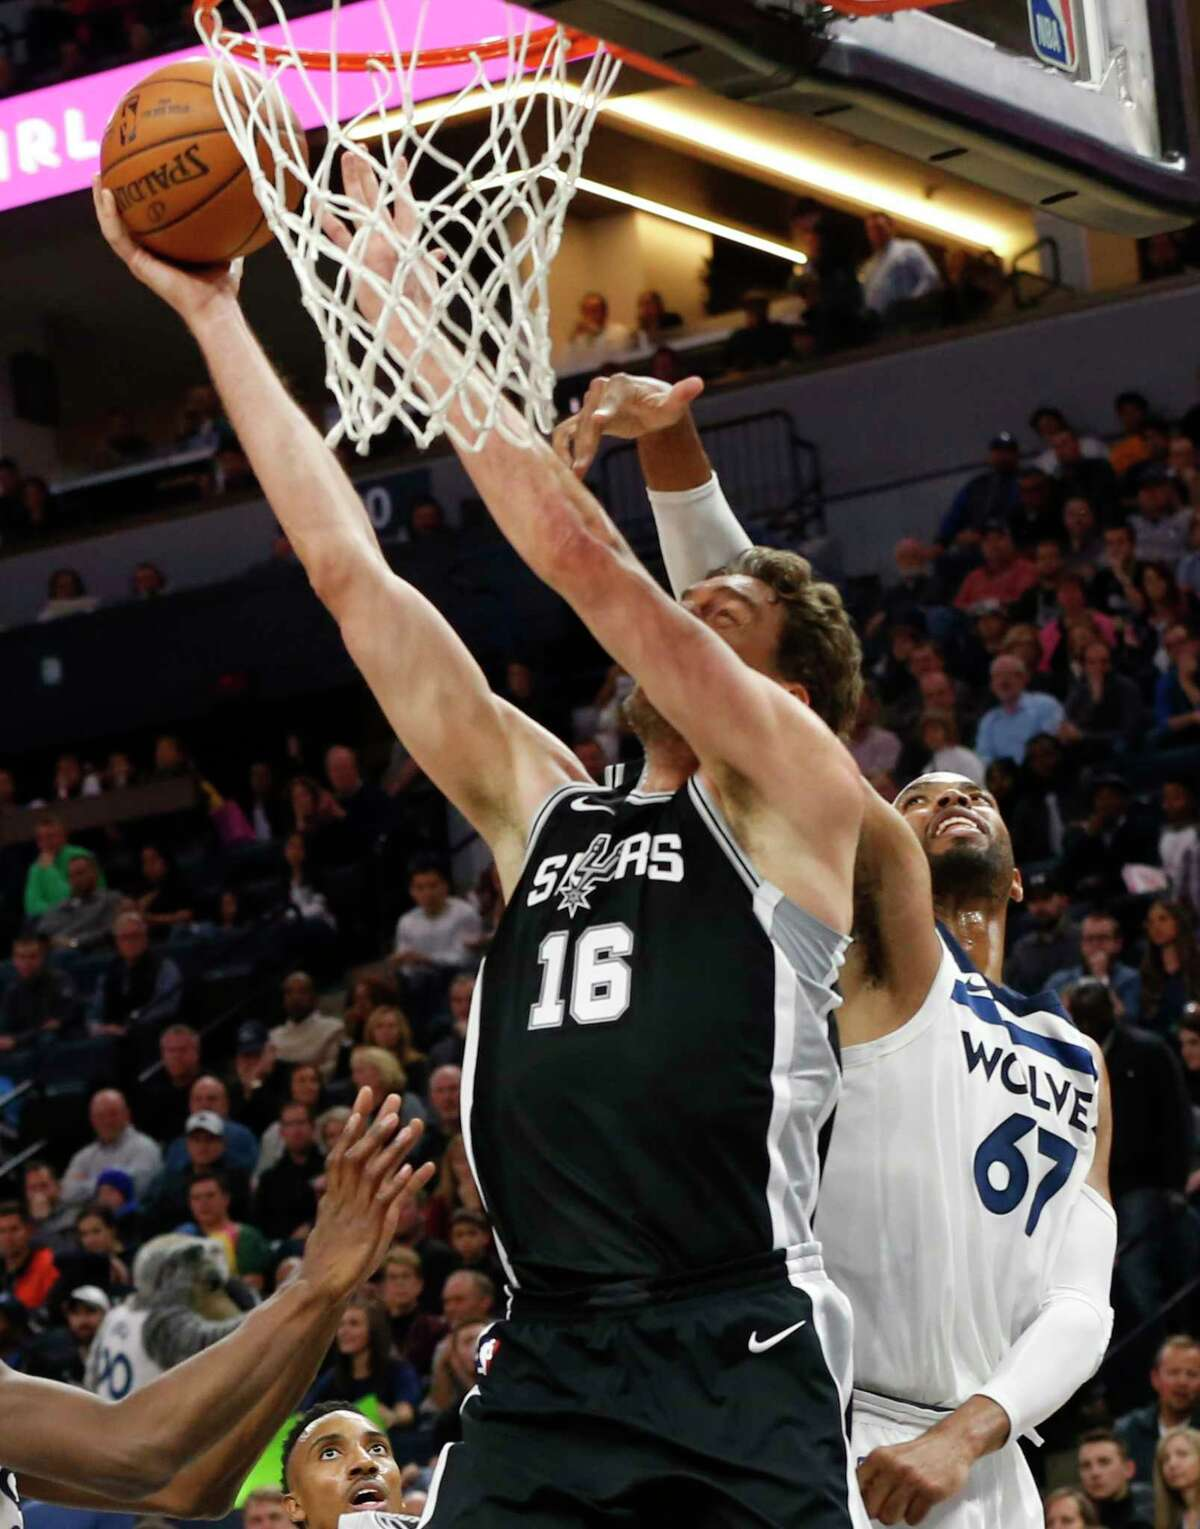 San Antonio Spurs' Pau Gasol, left, of Spain, is fouled by Minnesota Timberwolves' Taj Gibson during the first half of an NBA basketball game Wednesday, Nov. 15, 2017 in Minneapolis. (AP Photo/Jim Mone)